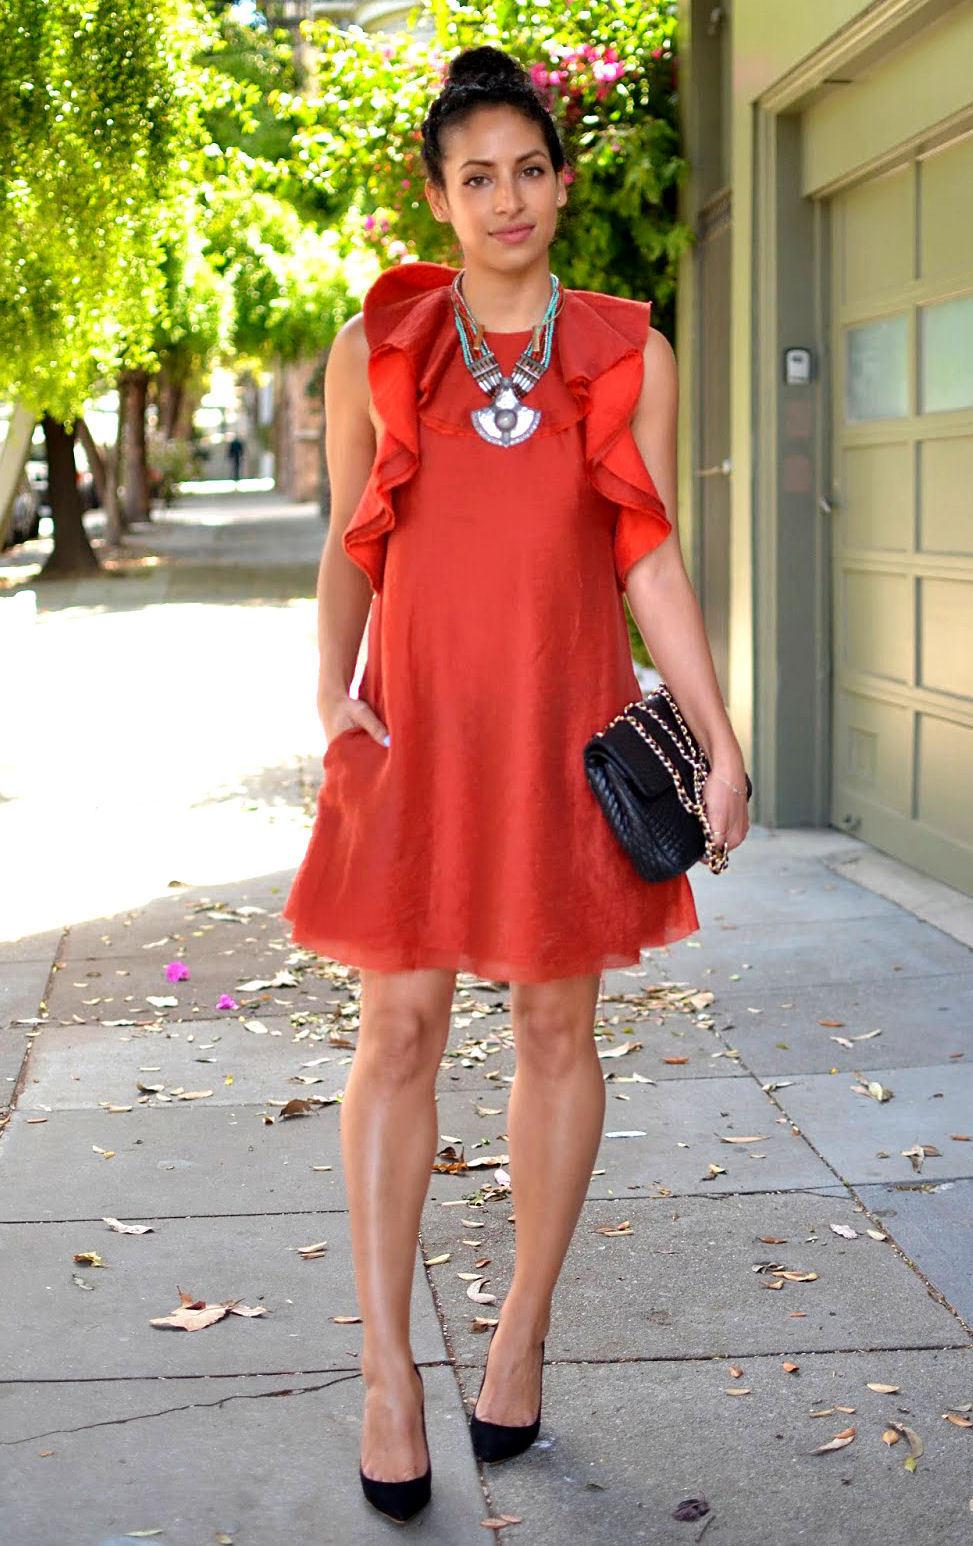 H&M Conscious Collection Collection Collection Ruffled A-Line Lyocell Mix Dress Orange rot UK 16 EU 42 | Angenehmes Aussehen  | Überlegen  | Deutschland Frankfurt  | Wonderful  | Hohe Qualität  60cd07